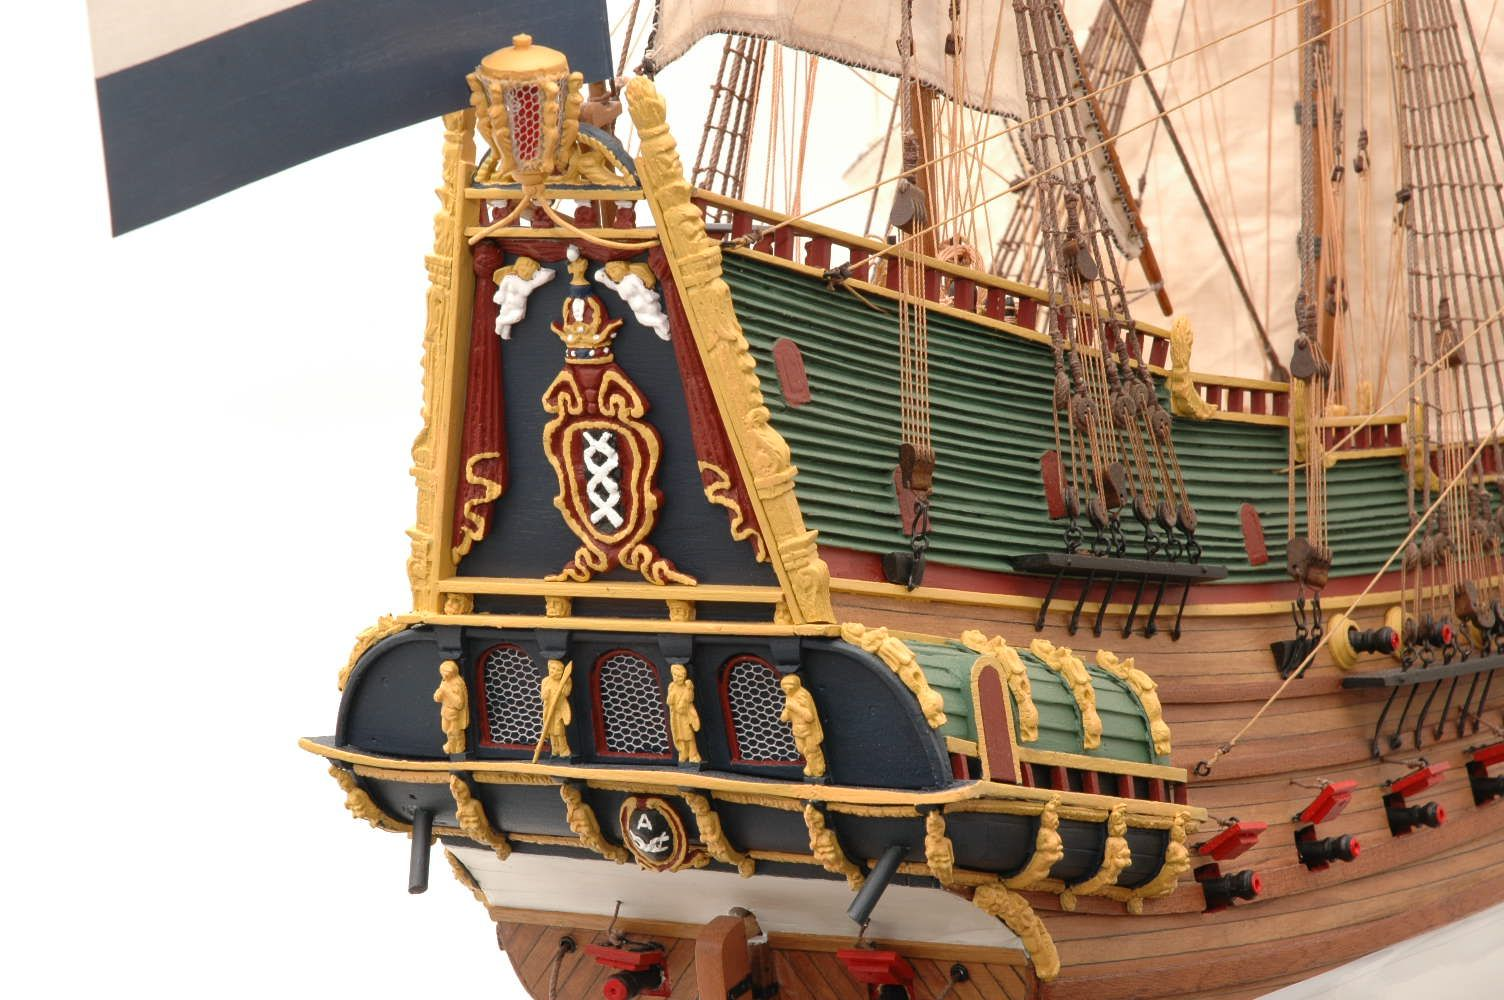 228-6952-Batavia-model-ship-Premier-Range